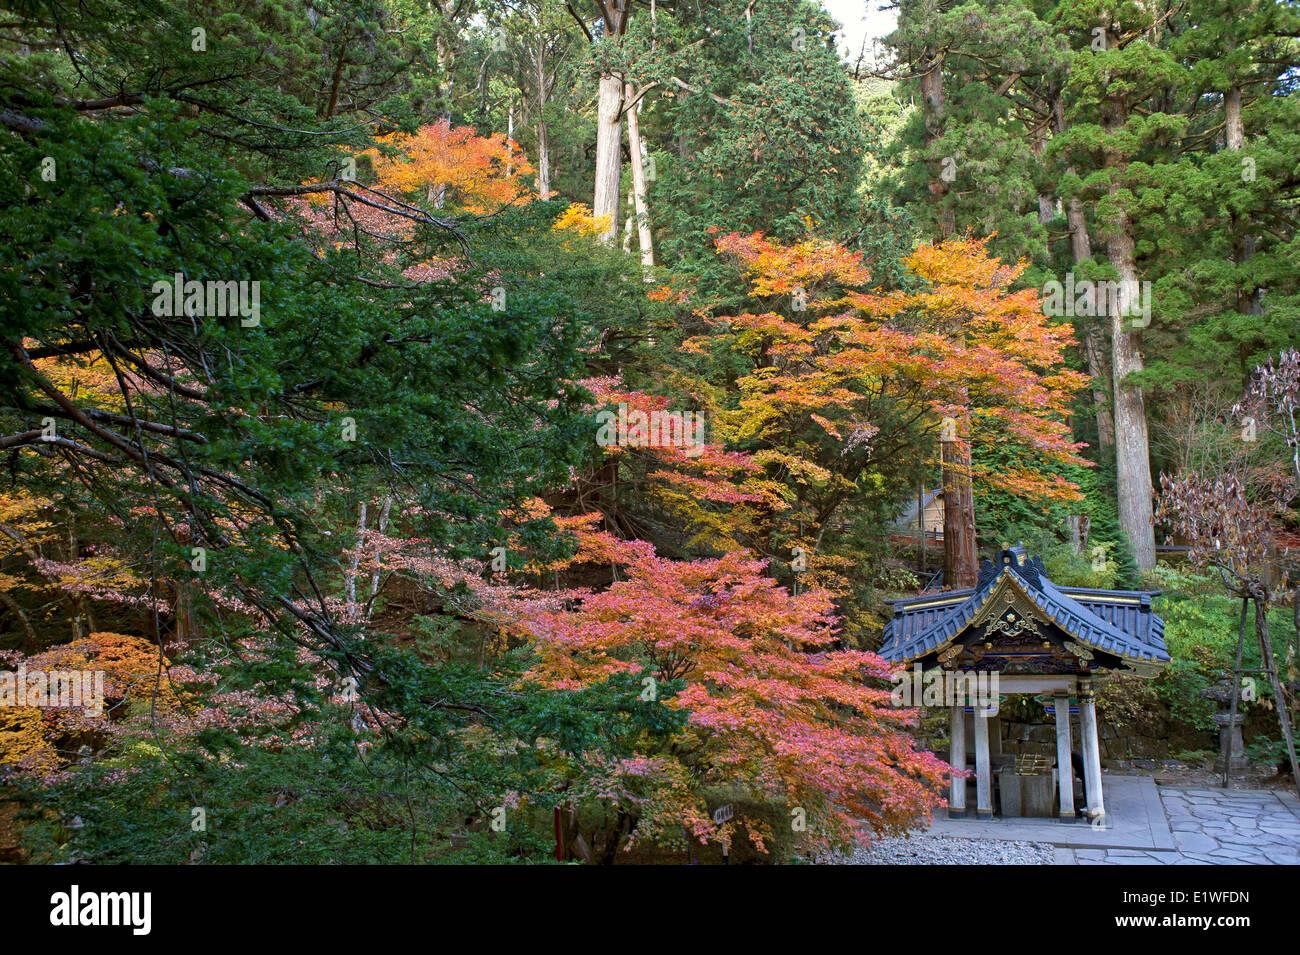 Purification pavilion in Futarasan Srine in Nikko, Japan - Stock Image